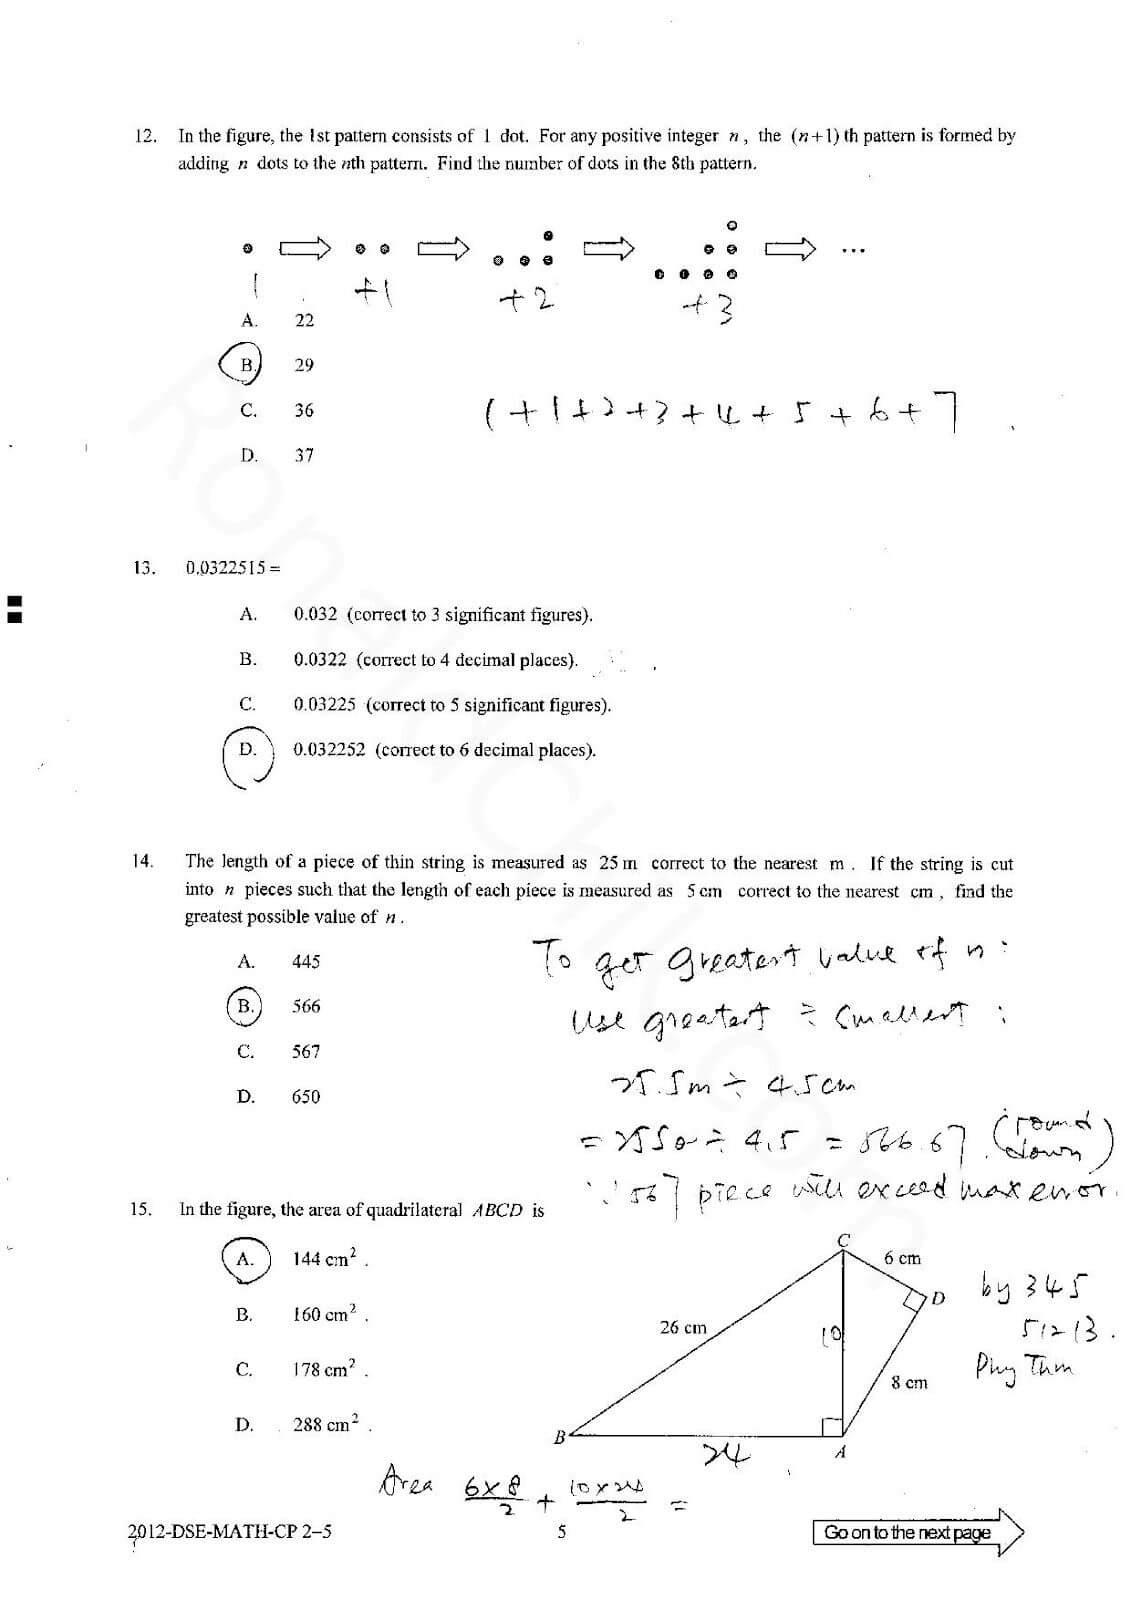 2012 DSE Math P2 卷二 Q12,13,14,15